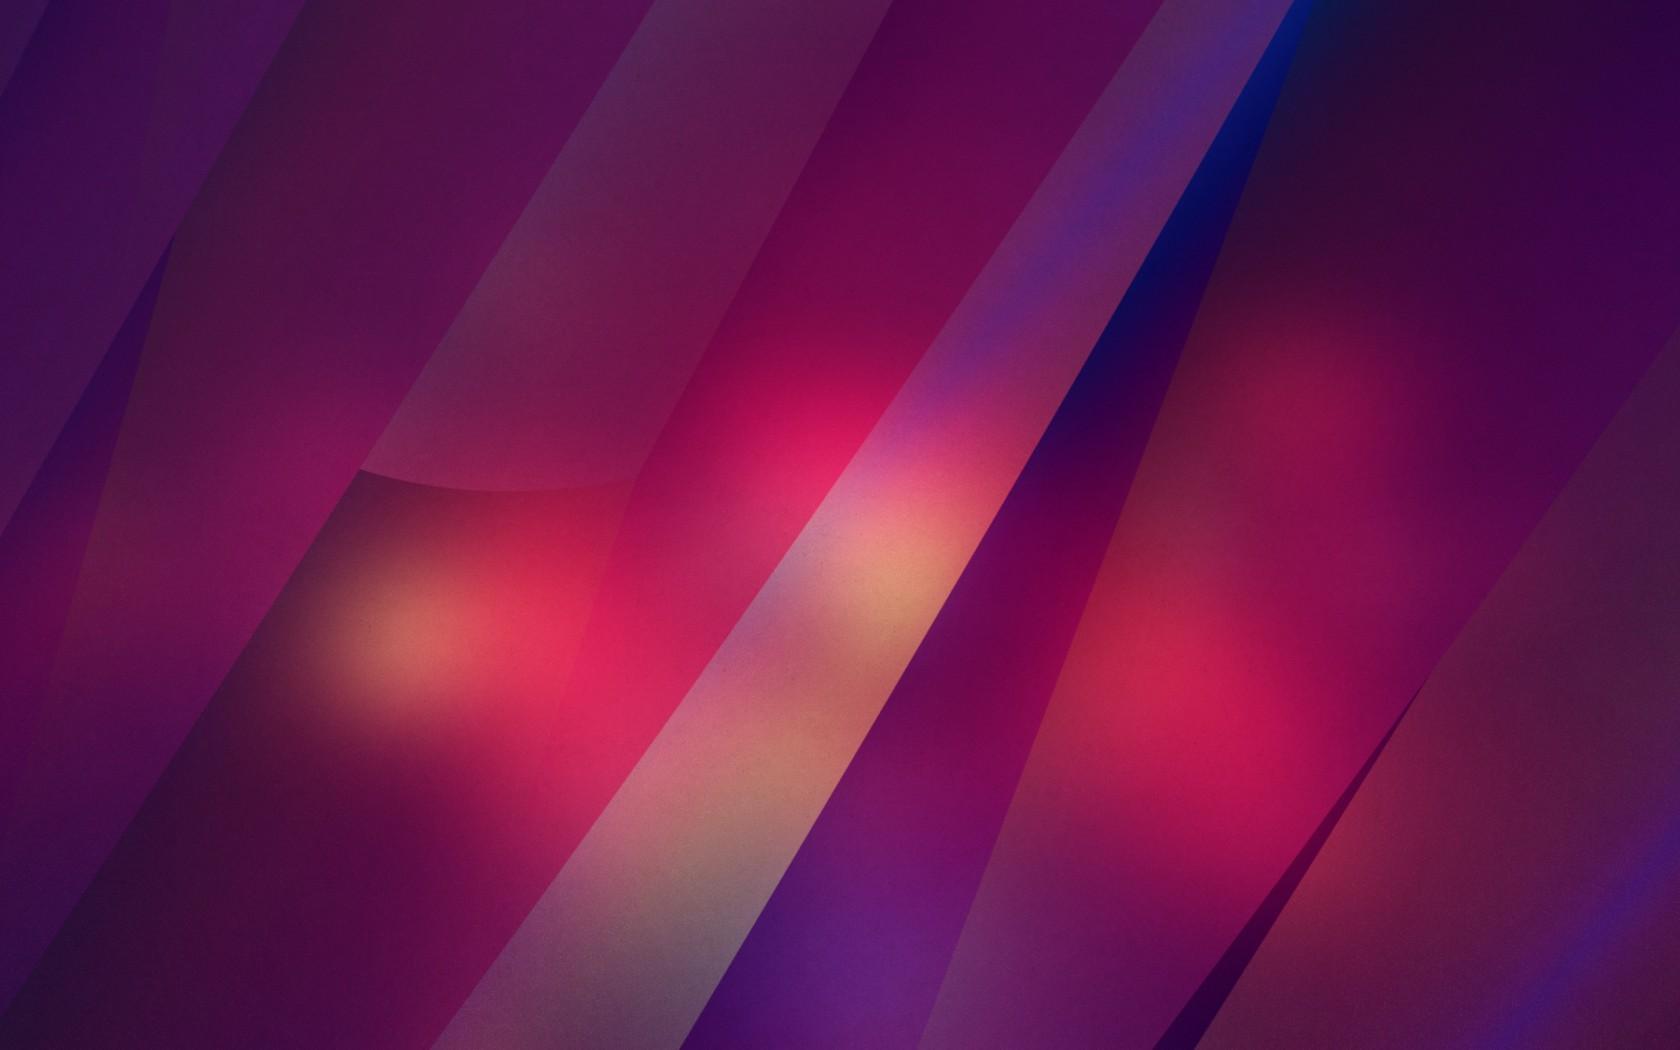 Cute Wallpapers Iphone 6 Plus Vivid Pink Hd Wallpapers Hd Wallpapers Id 21978